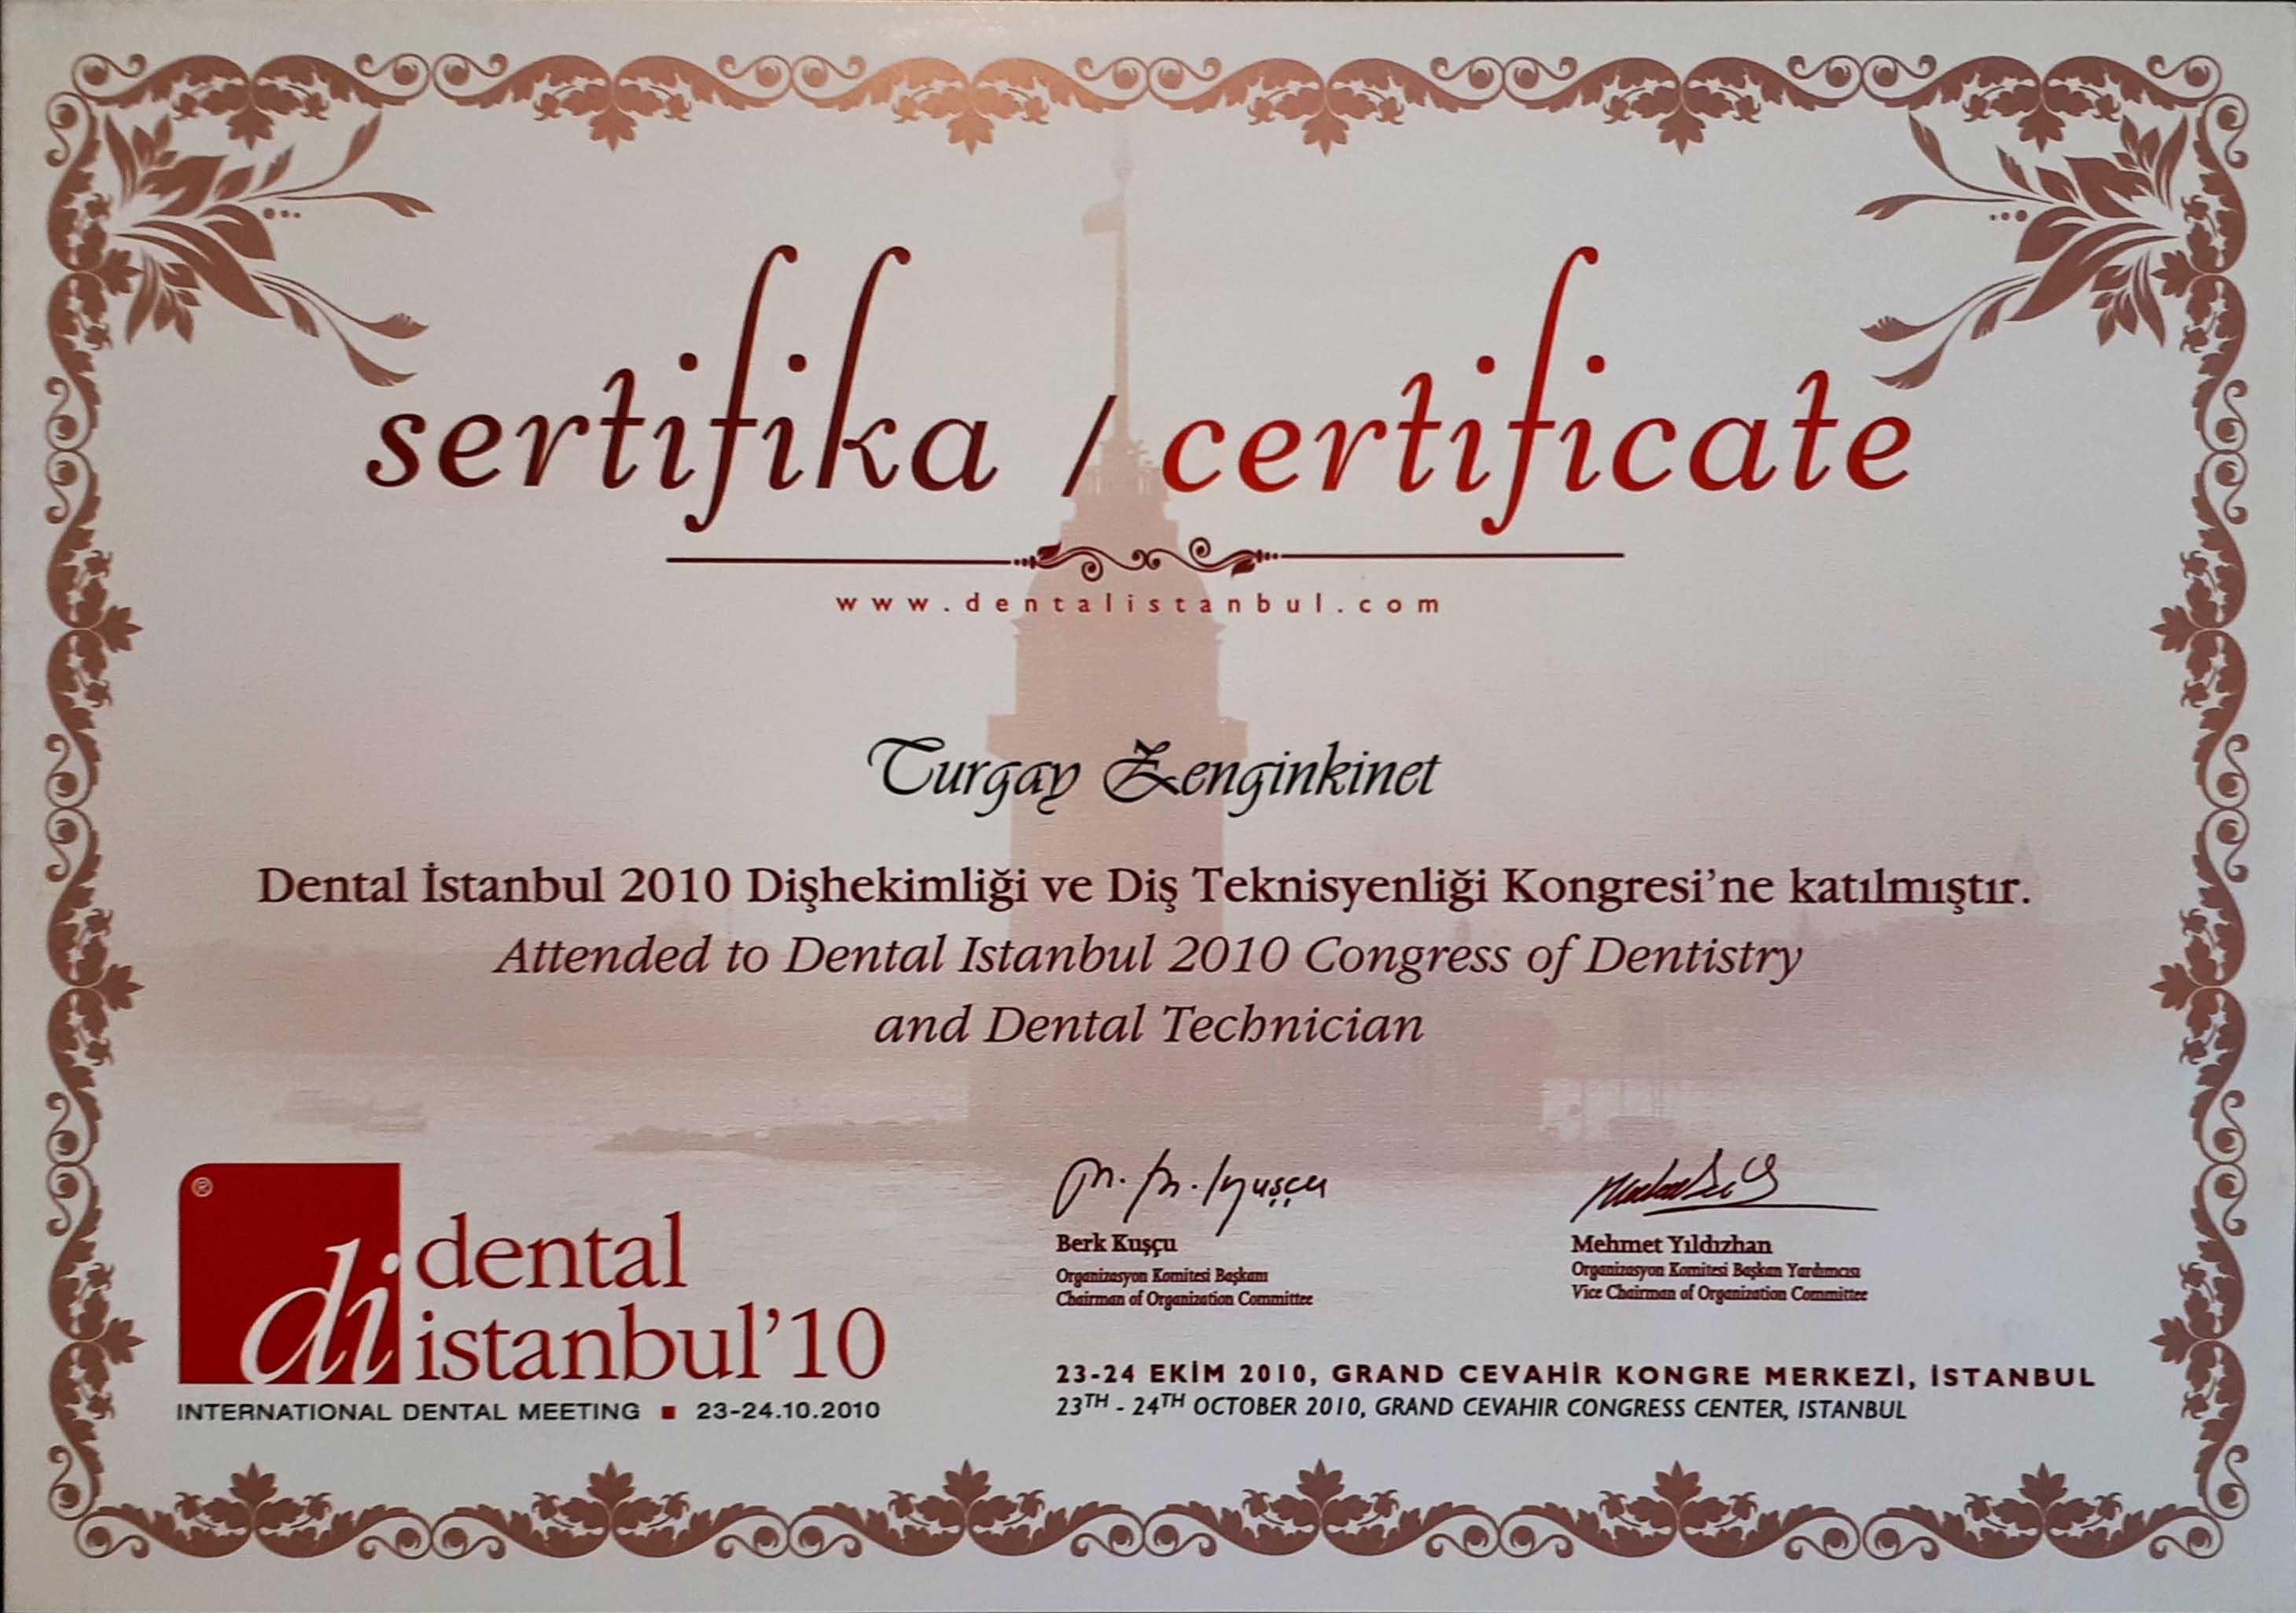 turgay-zenginkinet-sertifika-1